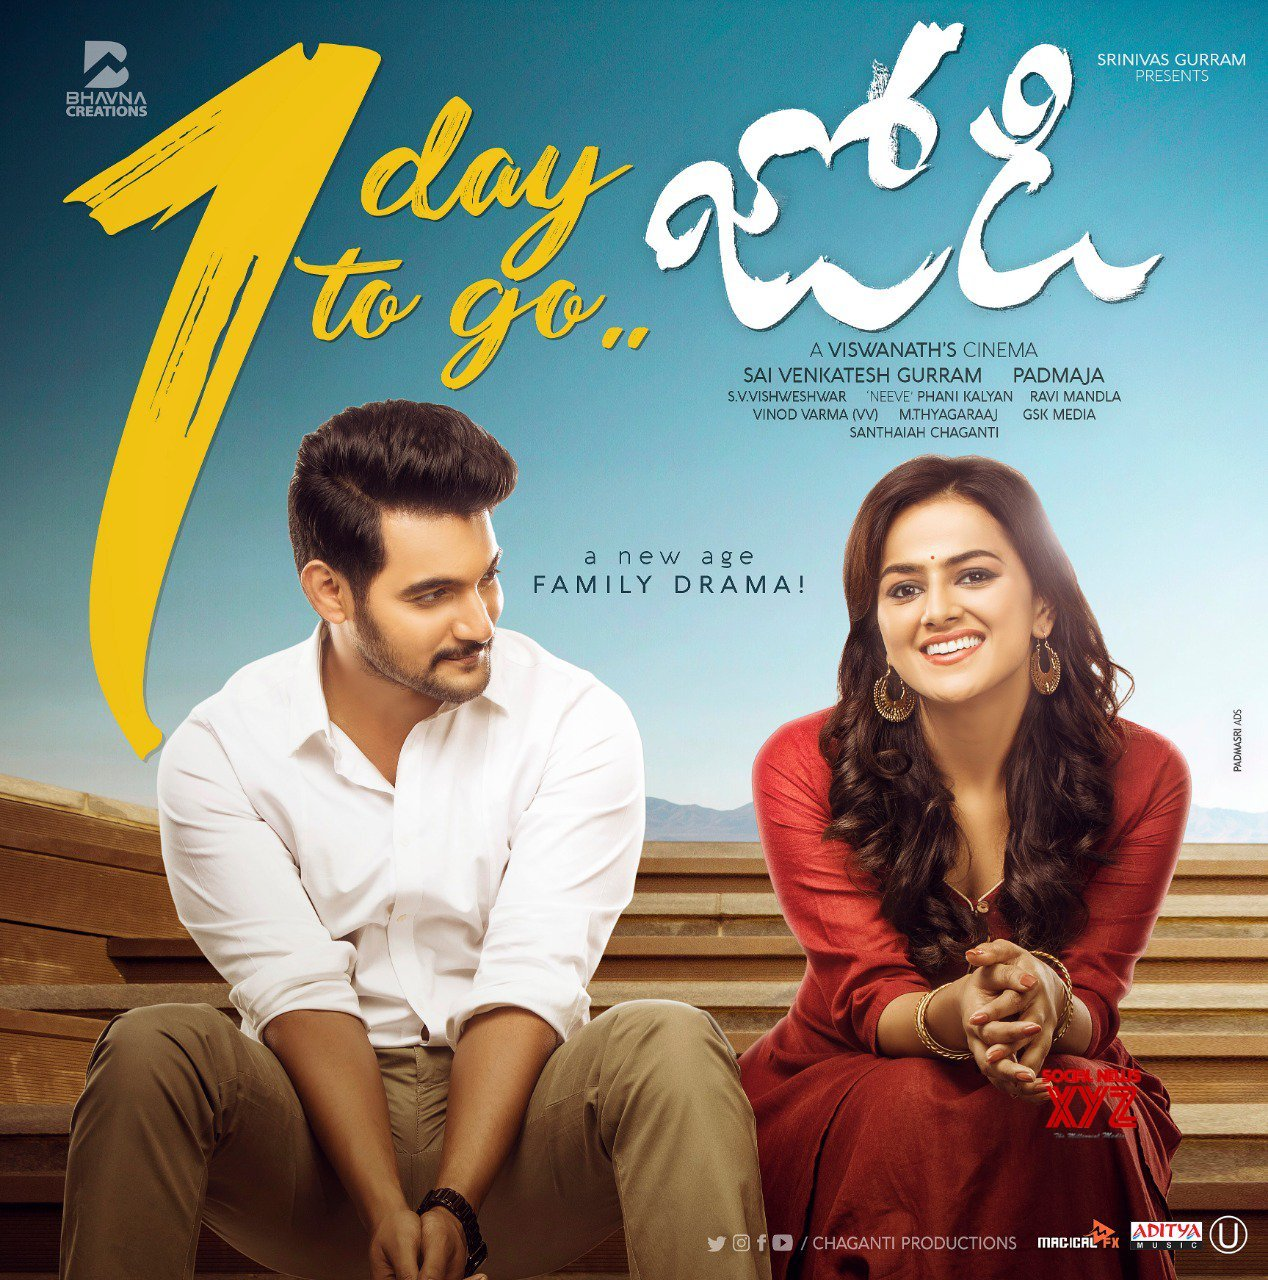 Aadi Saikumar And Shraddha Srinath's Jodi Movie 1 Day To Go Poster